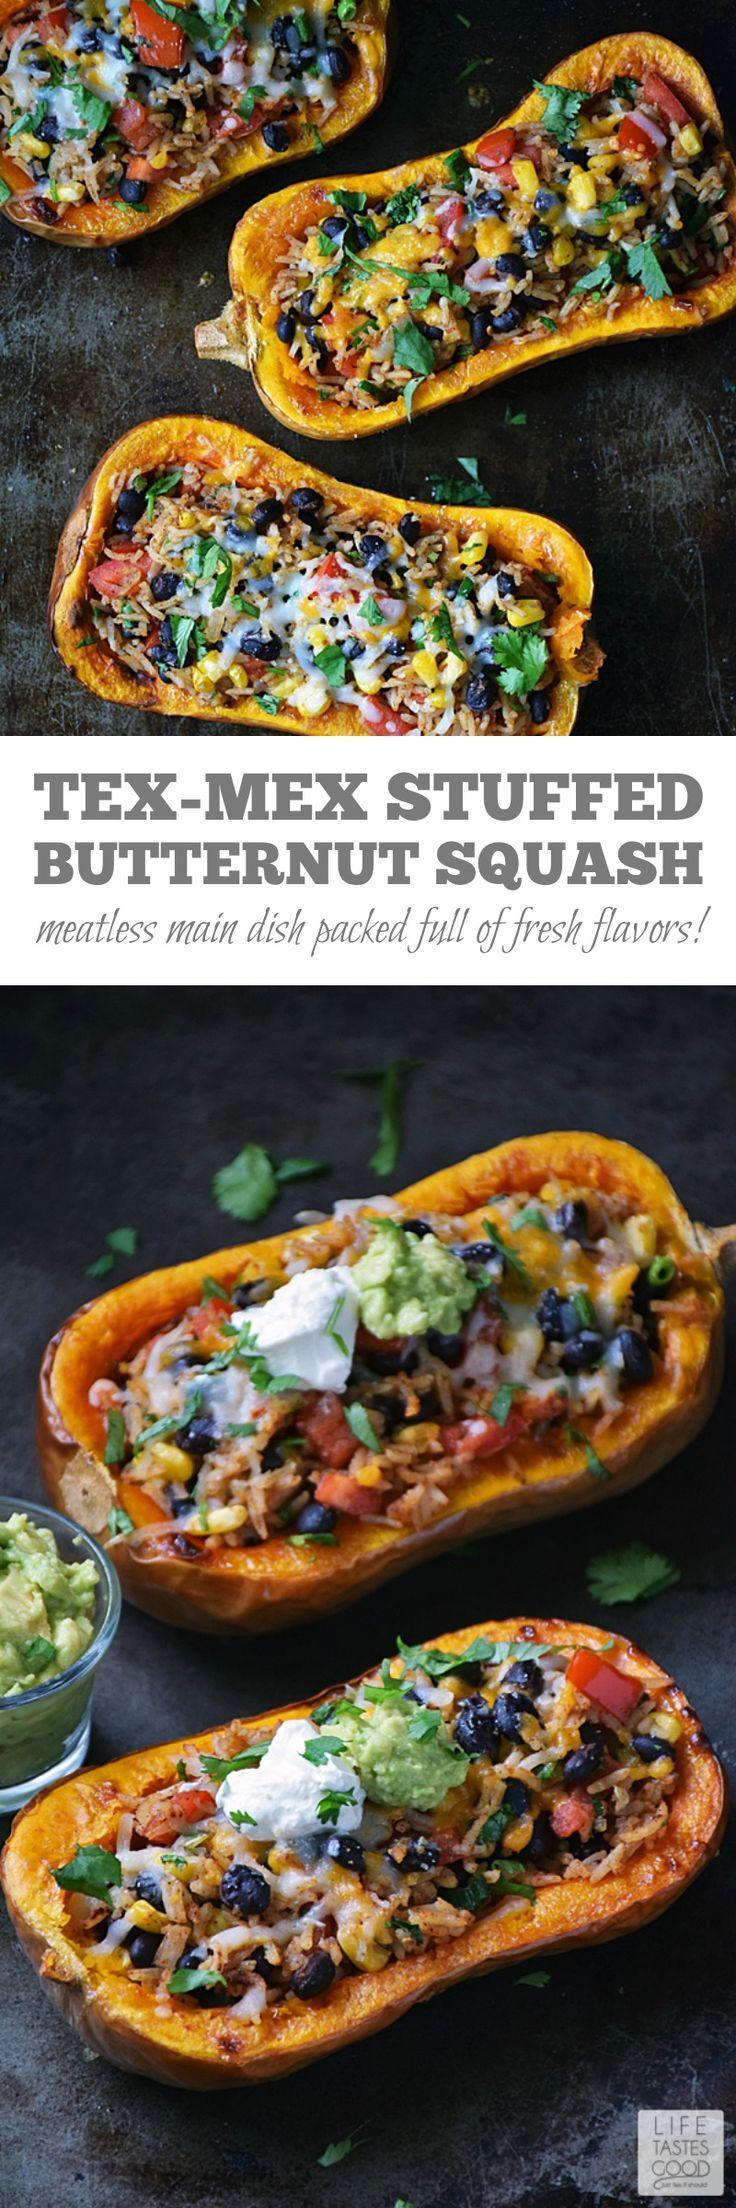 Stuffed Butternut Squash |